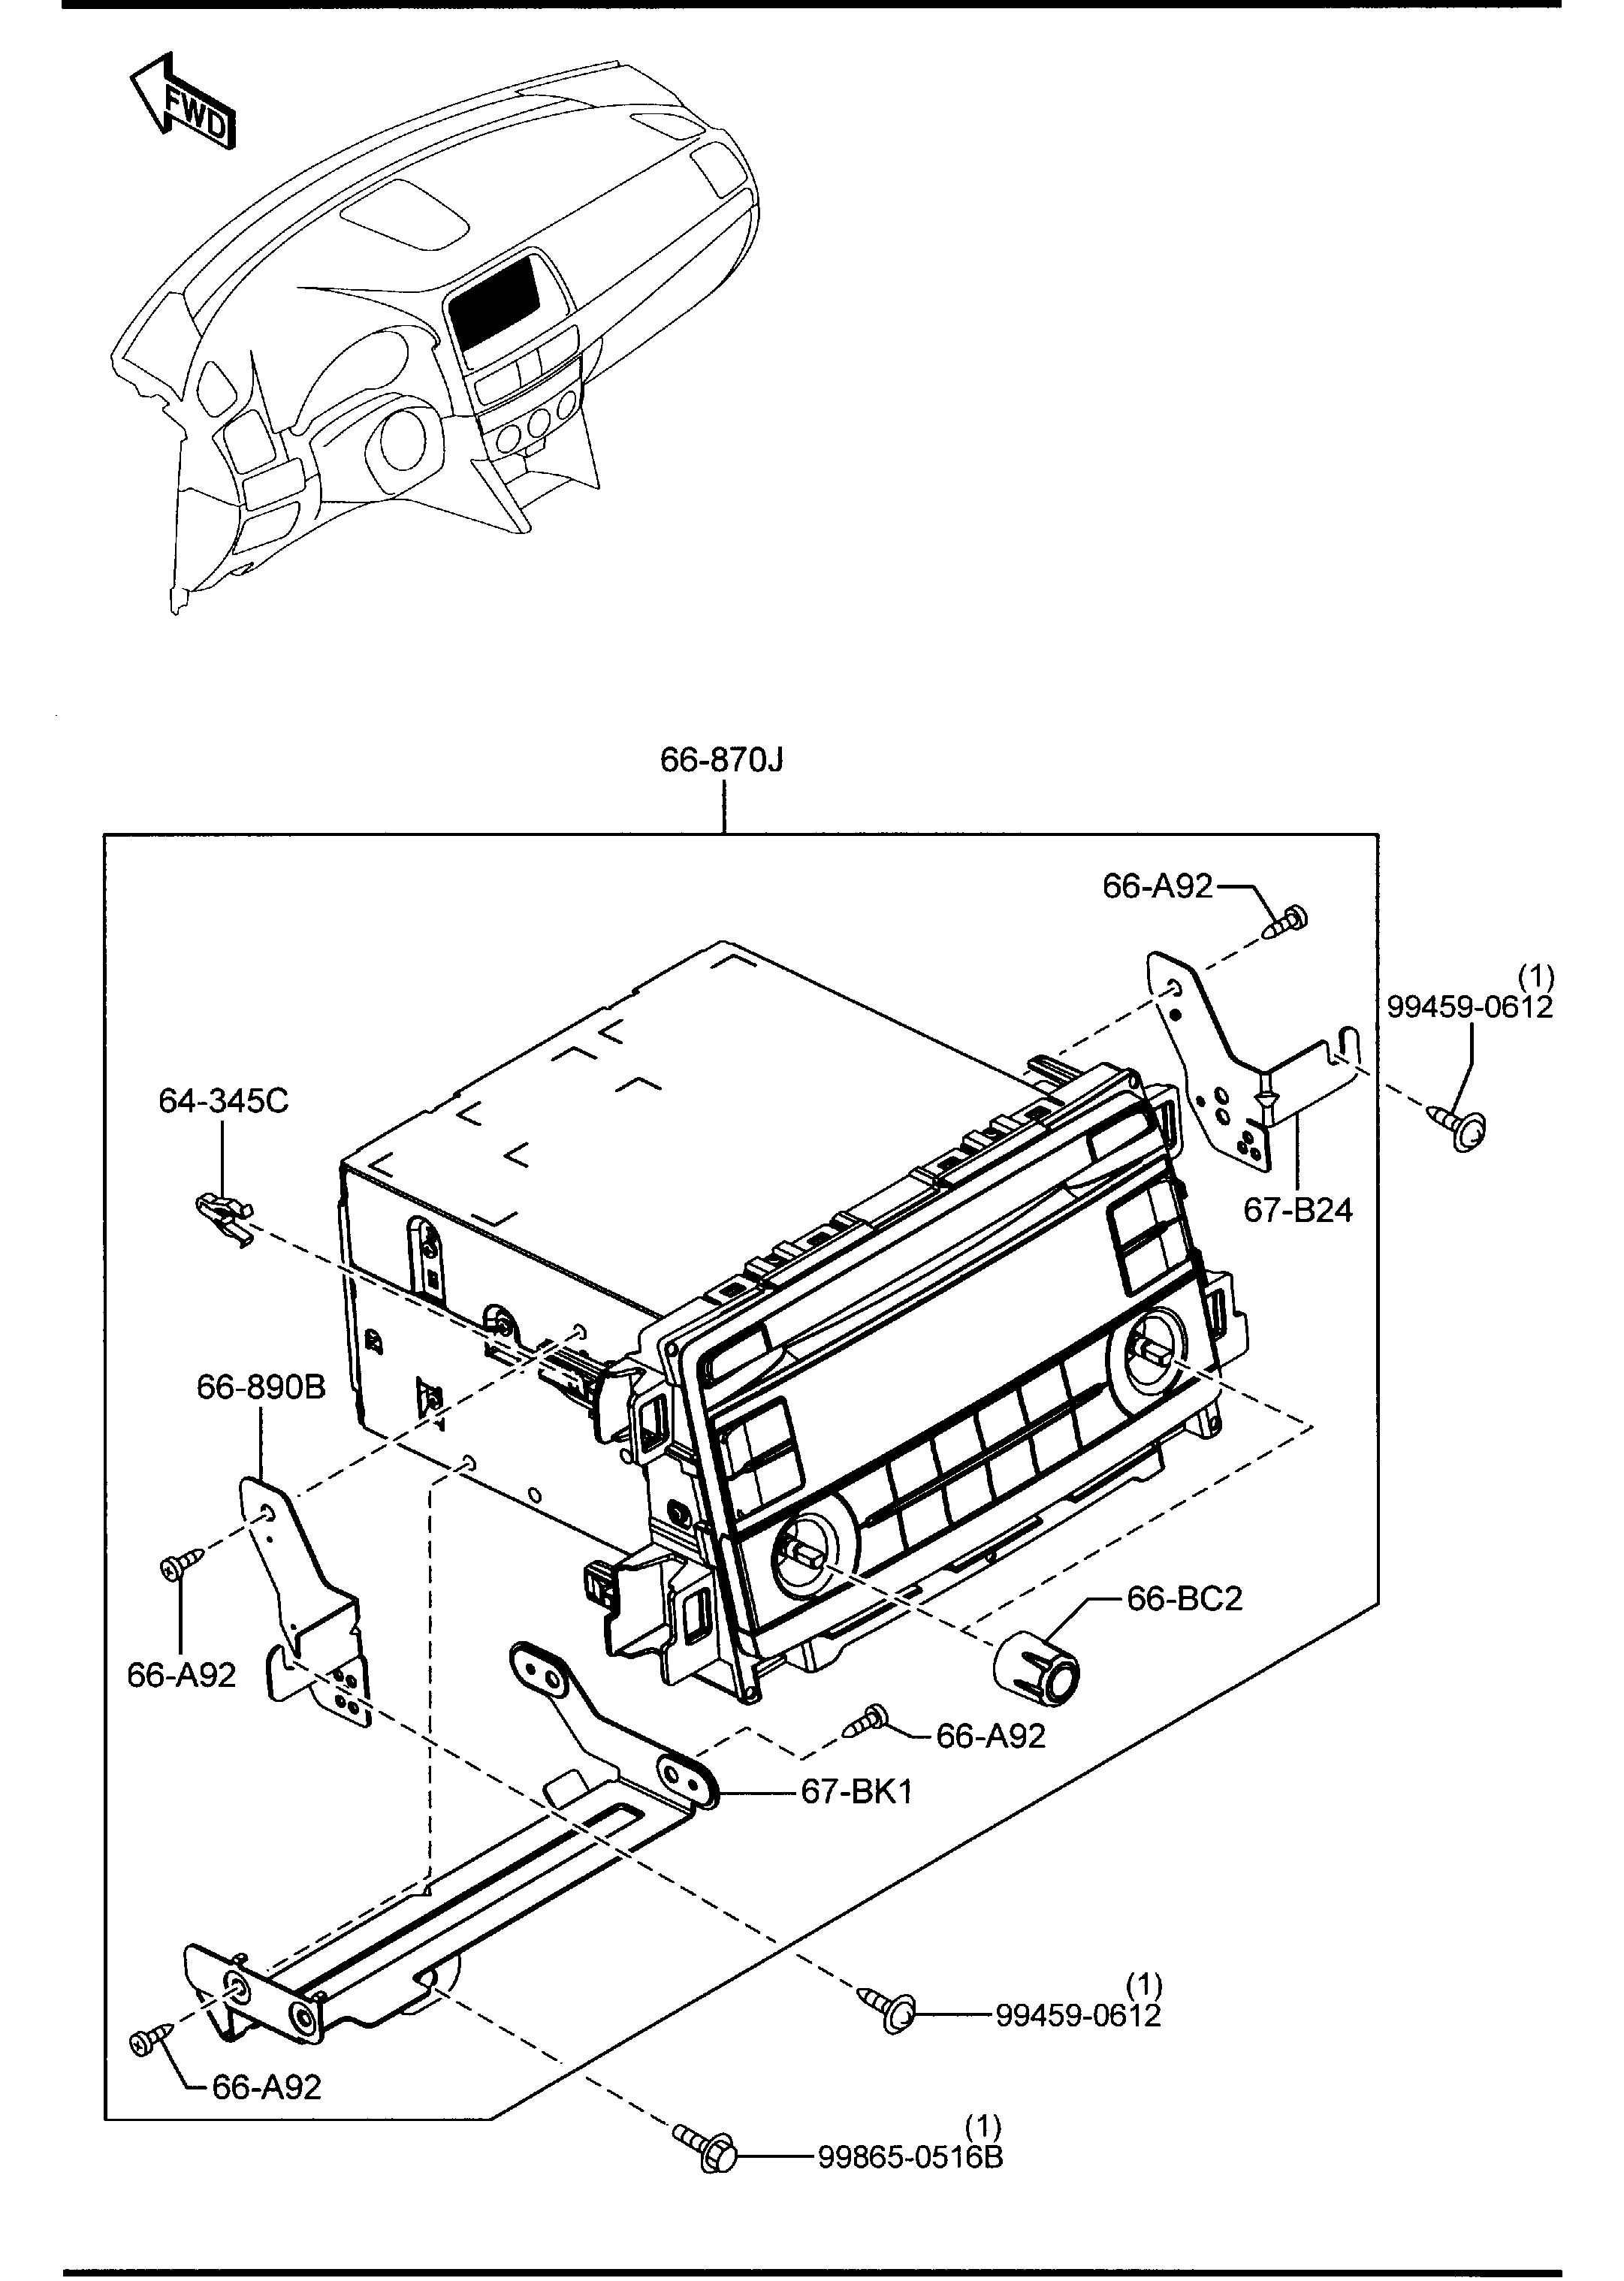 Mazda Cx-5 Audio Set